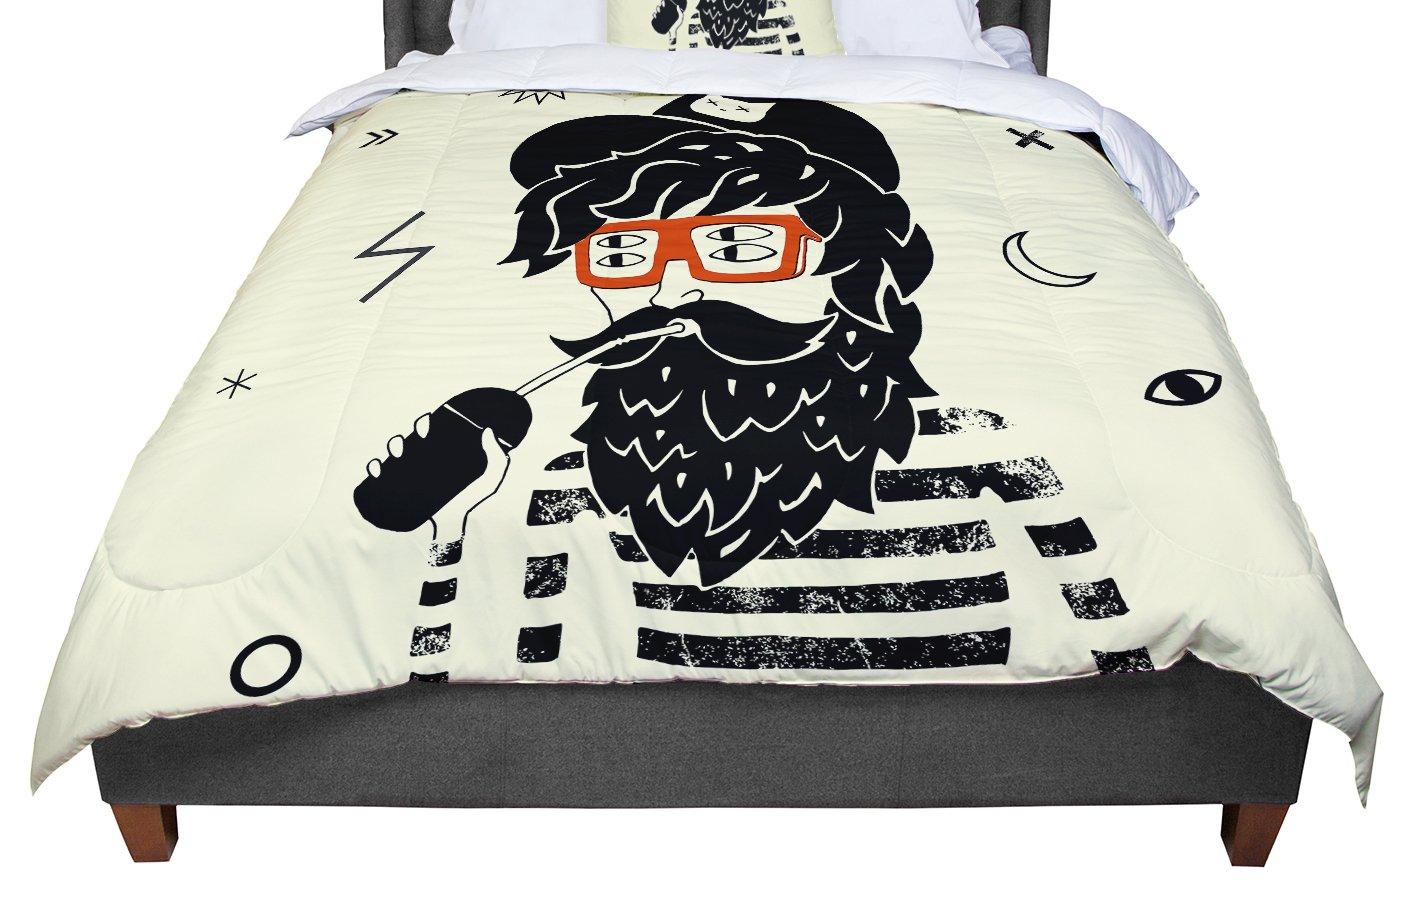 68 X 88 KESS InHouse Anya Volk Dreamer Yellow People Twin Comforter